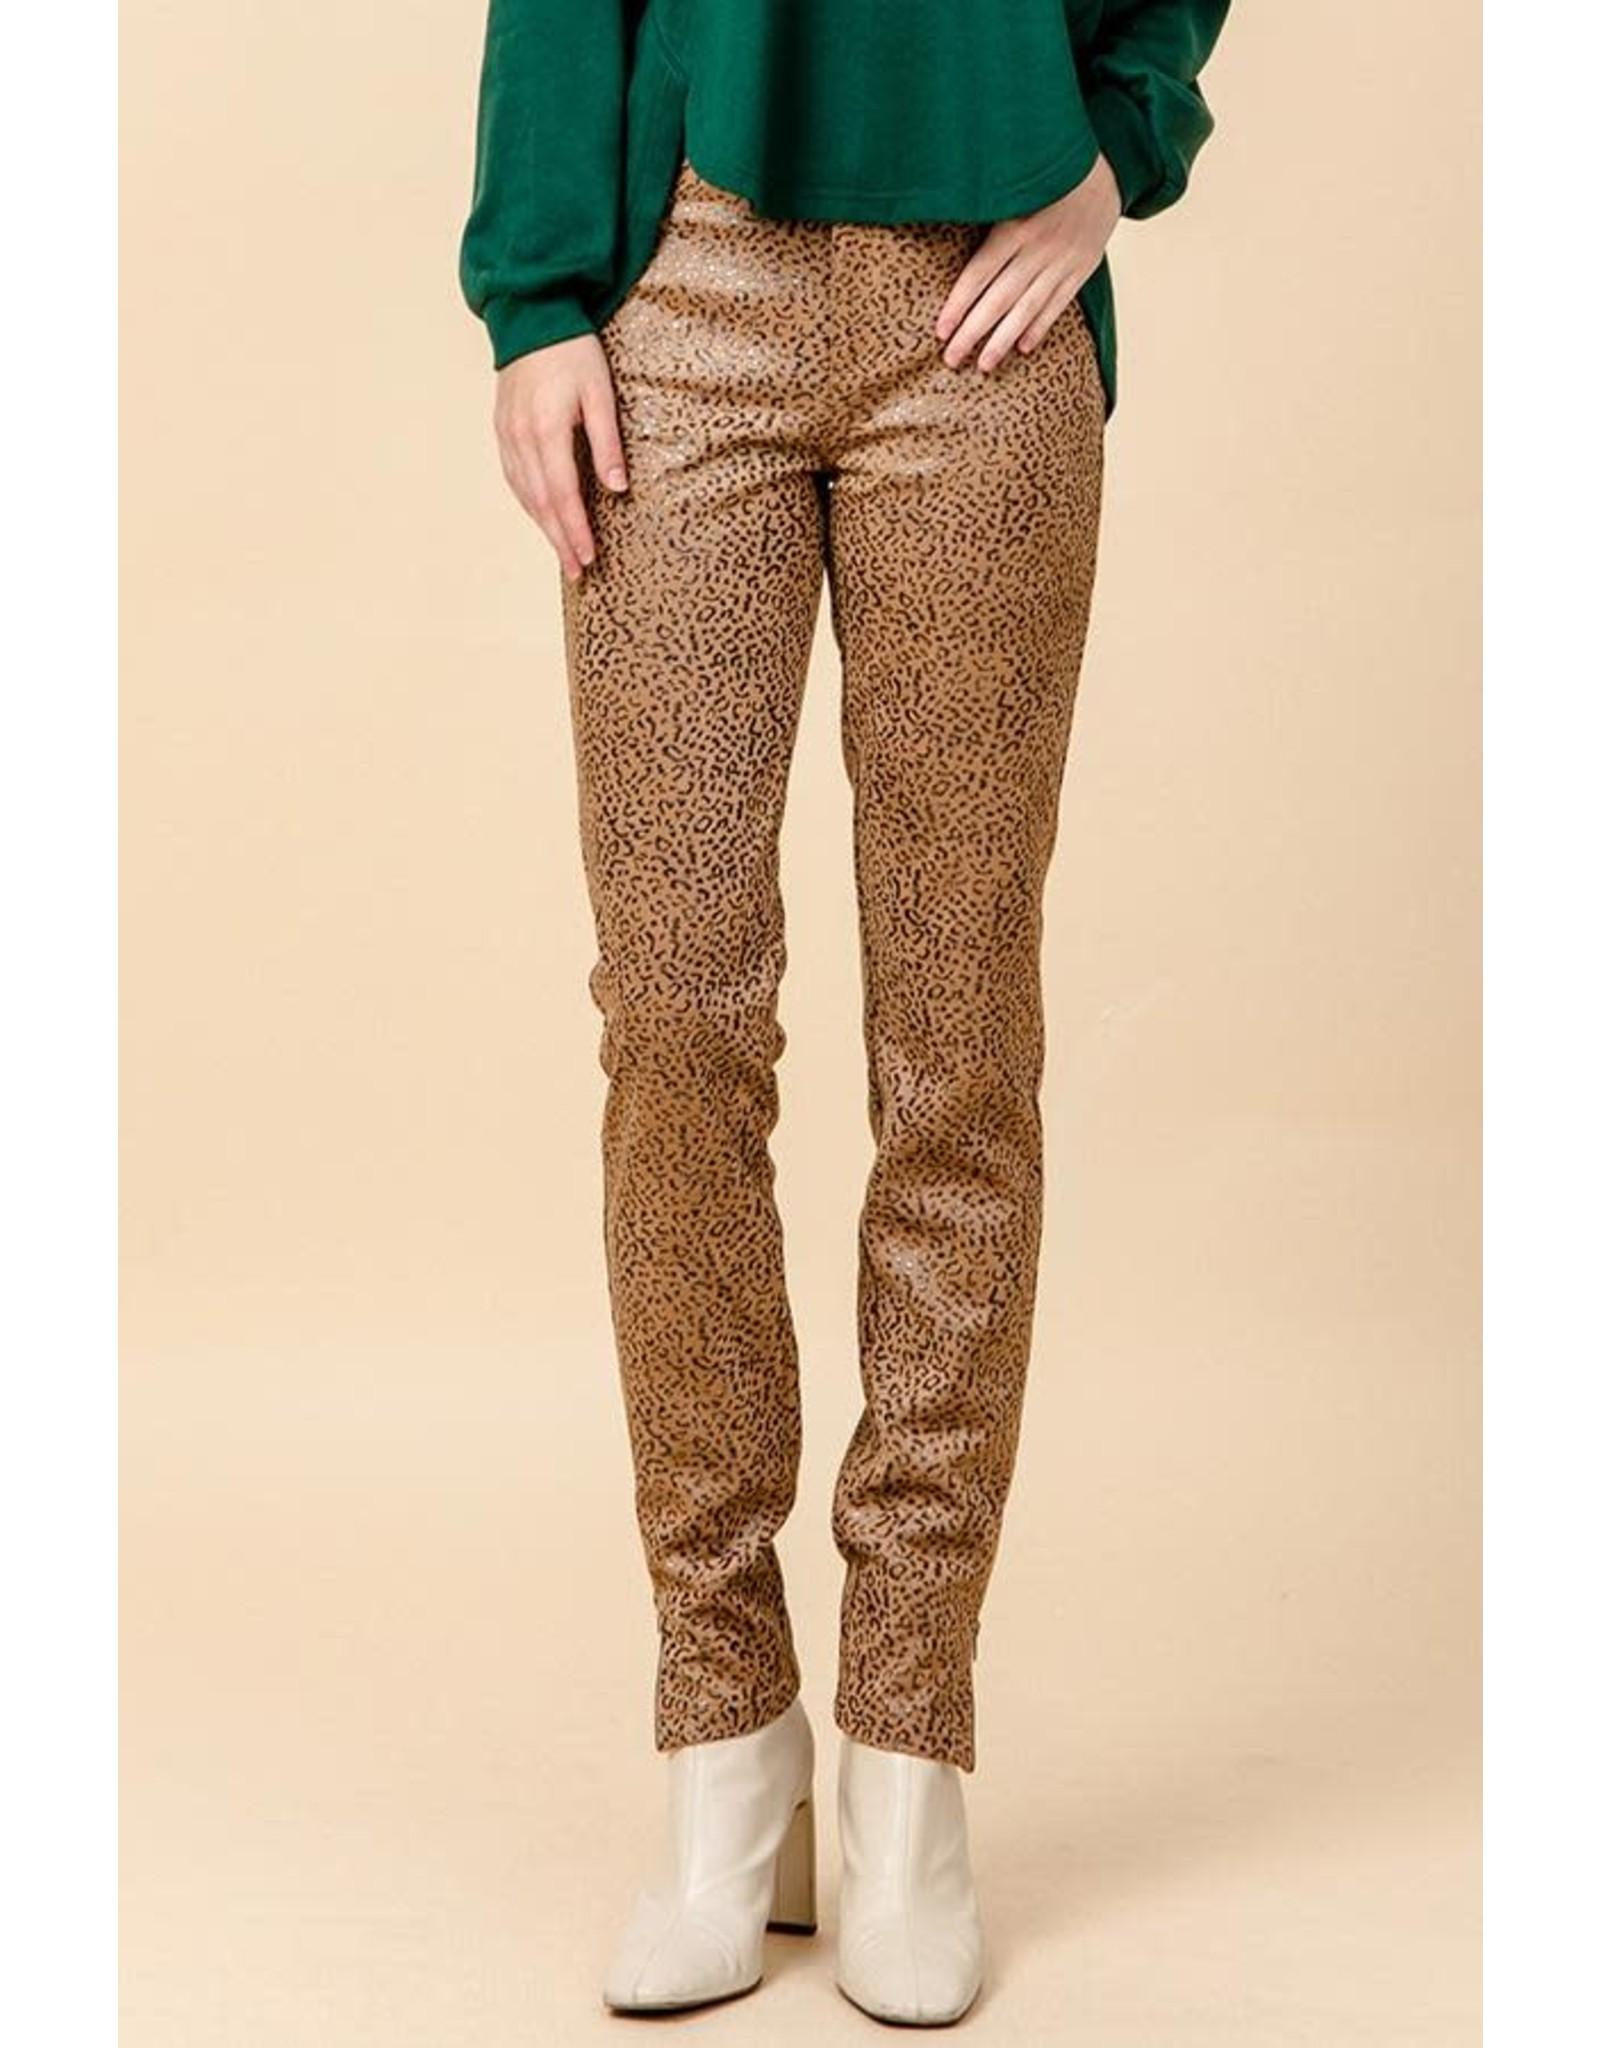 HYFVE LEO Leopard Print Pants